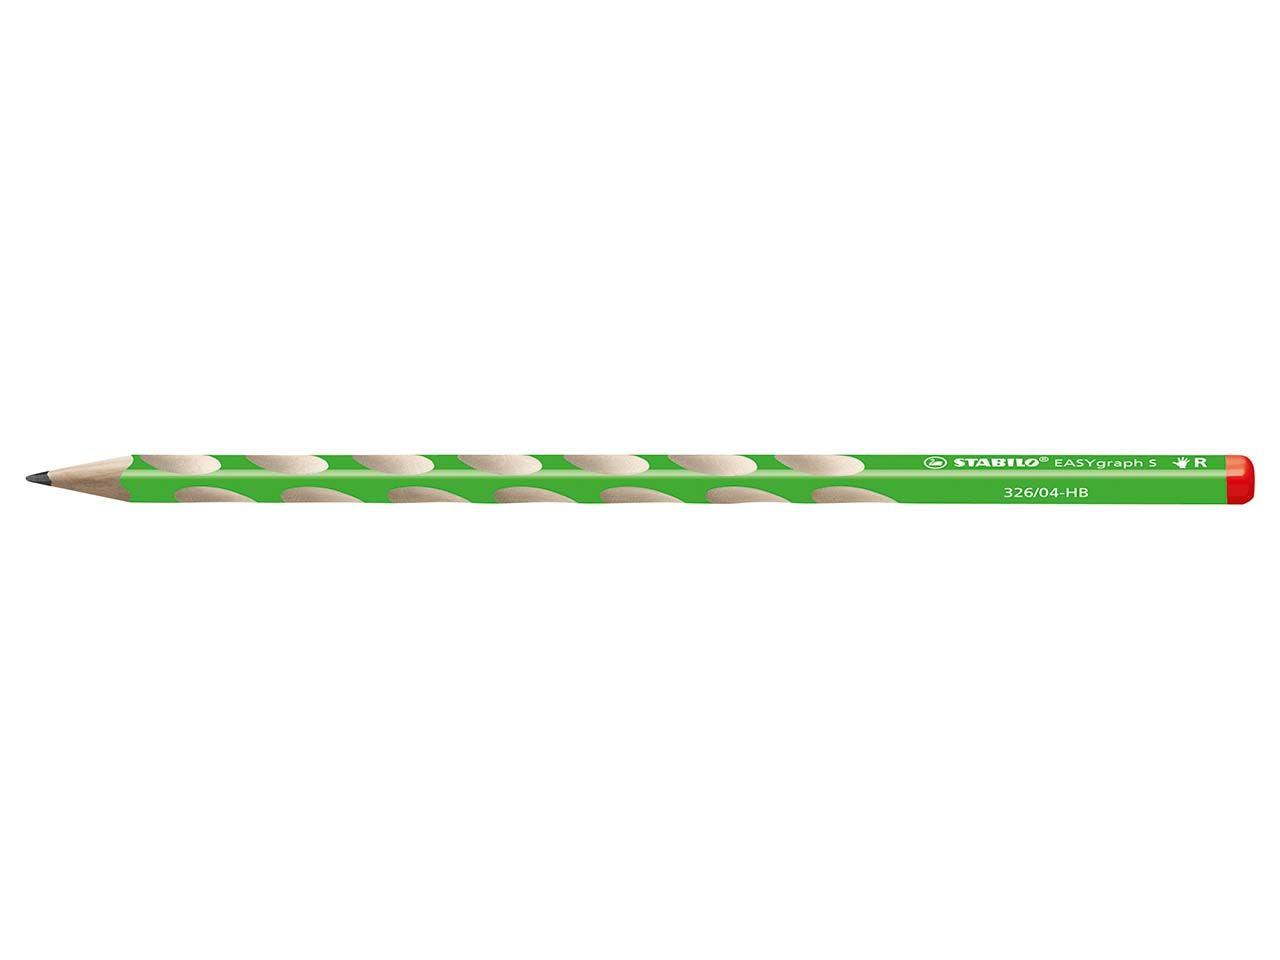 STABILO Bleistift 'EASYgraph S' grün 326/04-HB